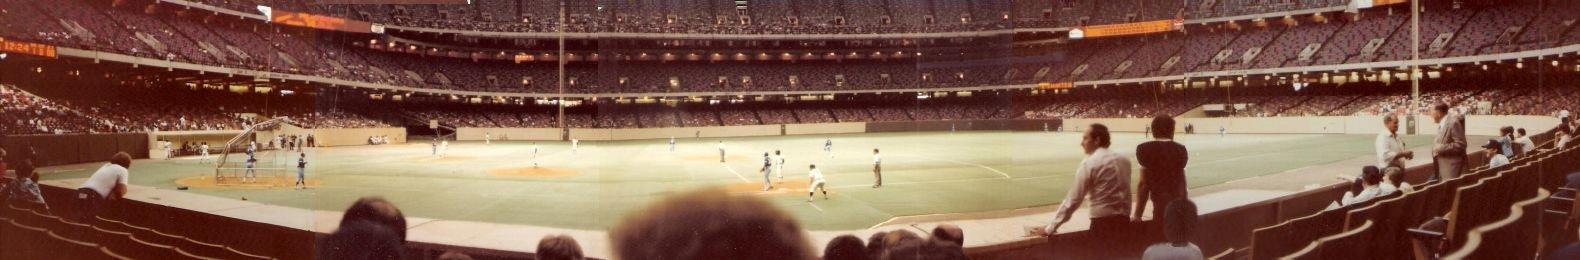 Clems Baseball Superdome